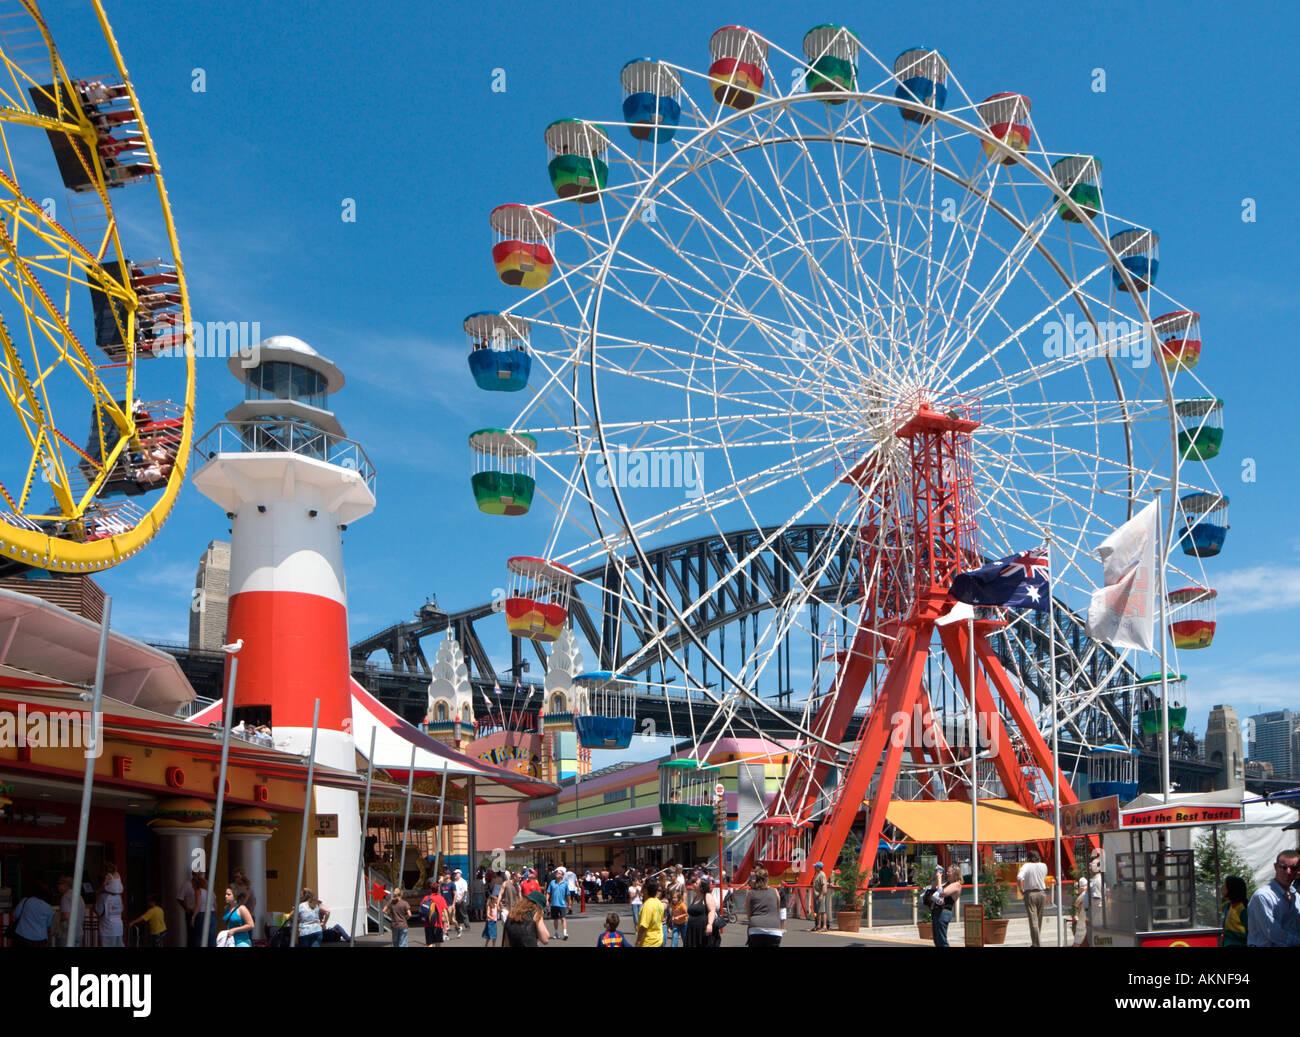 El Luna Park, con el Harbour Bridge detrás, Milsons Point, Sydney, New South Wales, Australia Imagen De Stock